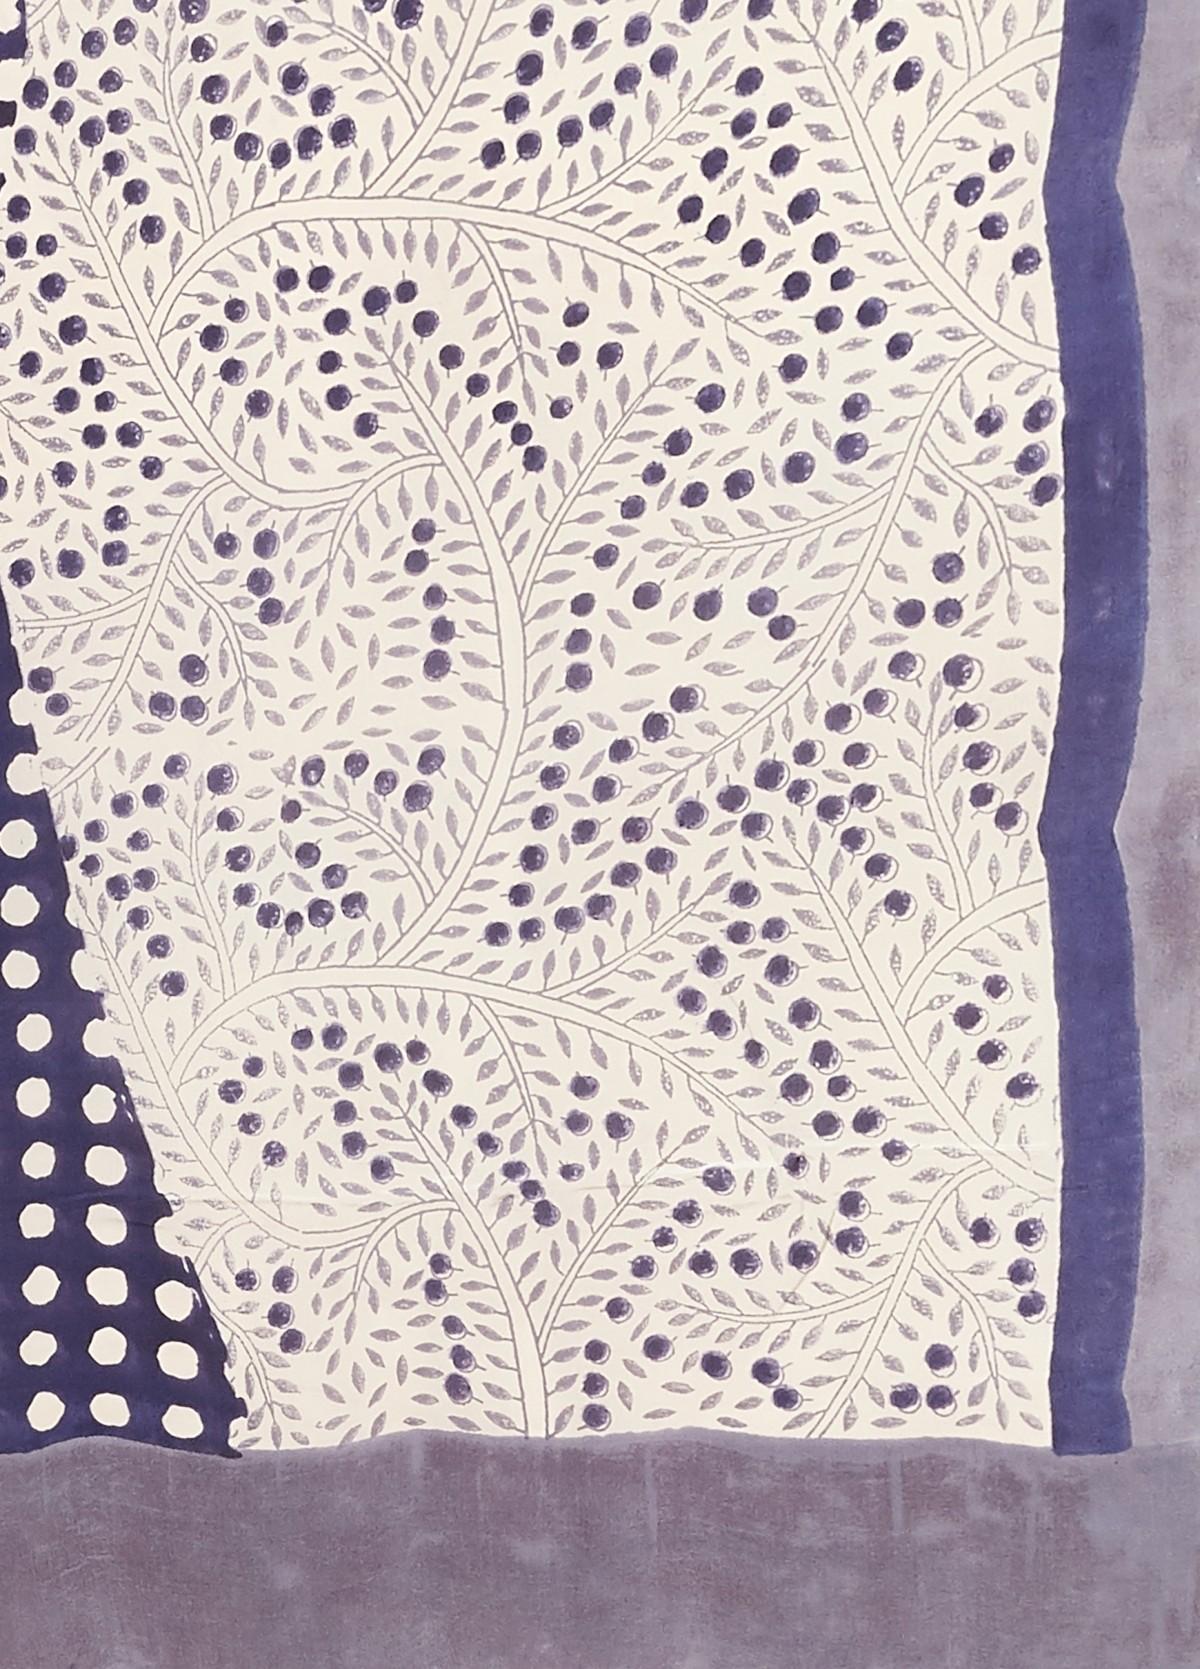 The Patashi Sari